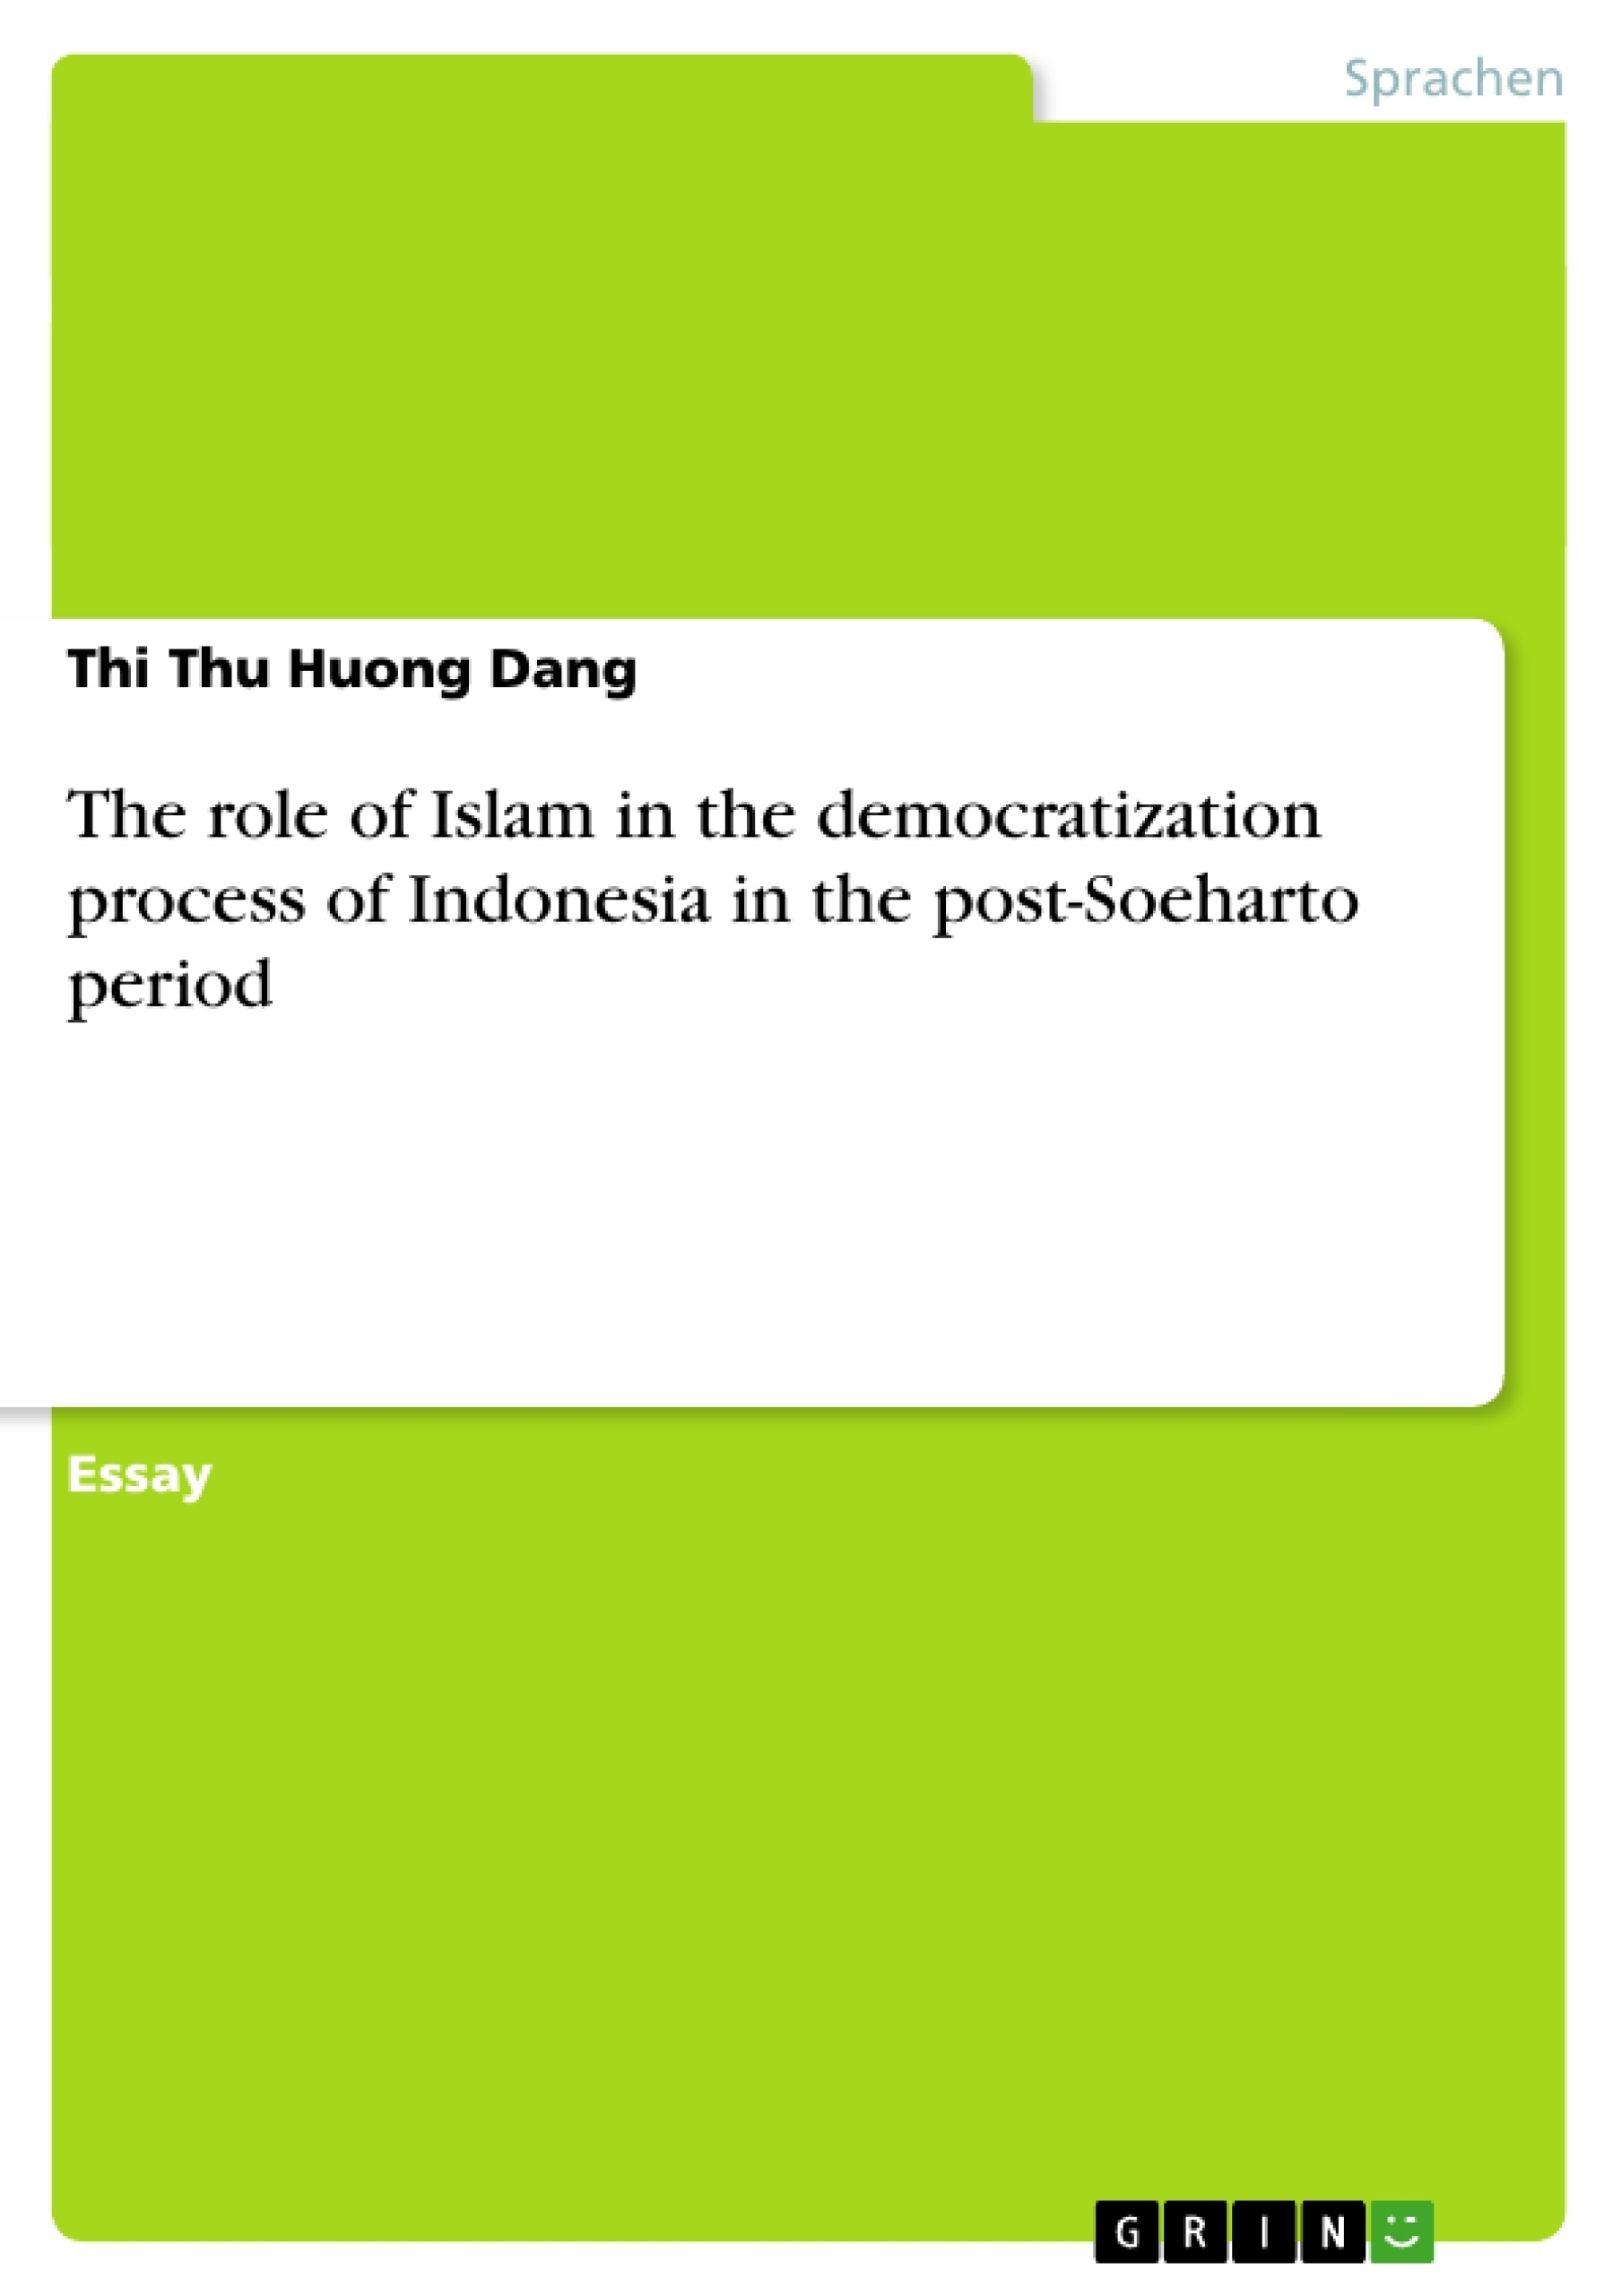 Titel: The role of Islam in the democratization process of Indonesia in the post-Soeharto period